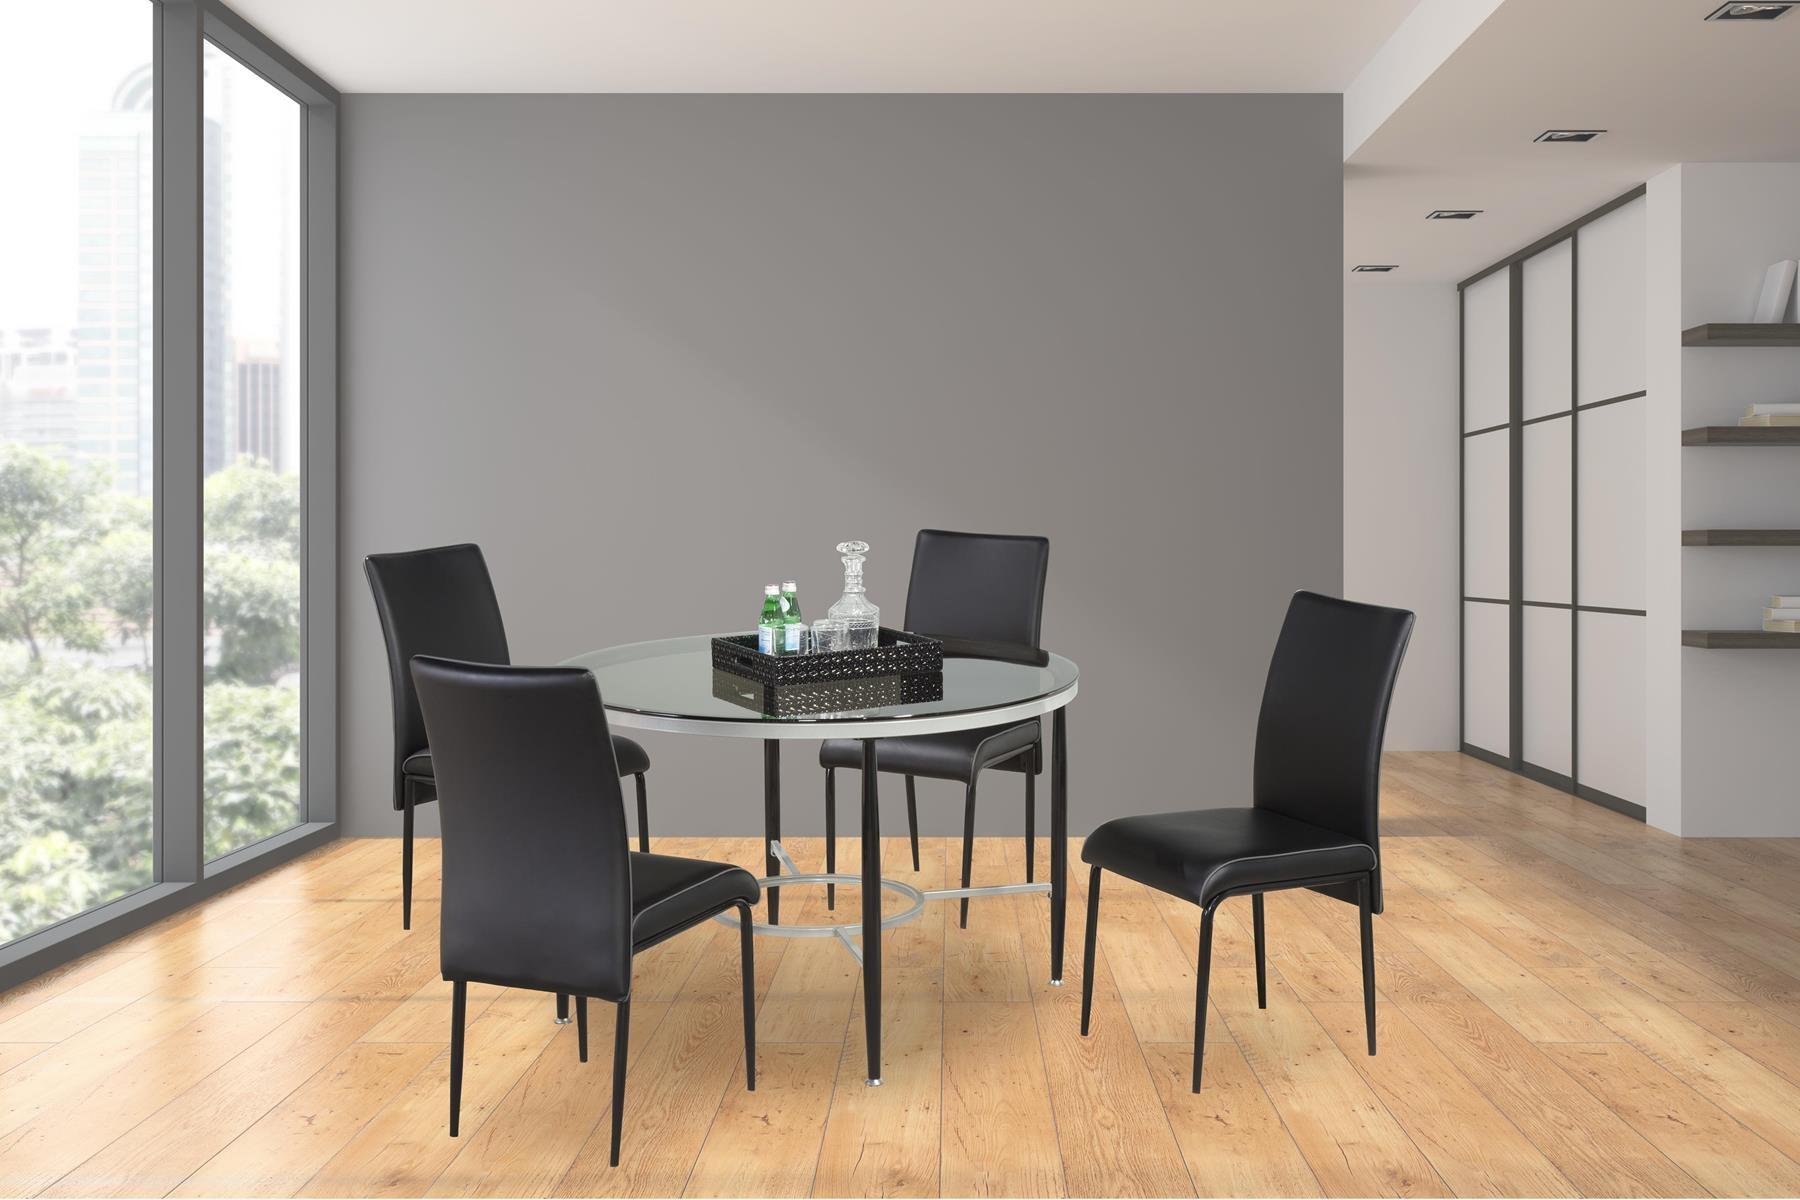 Bernards Dining Room Athena Casual Dining Table 4504 Gilliam